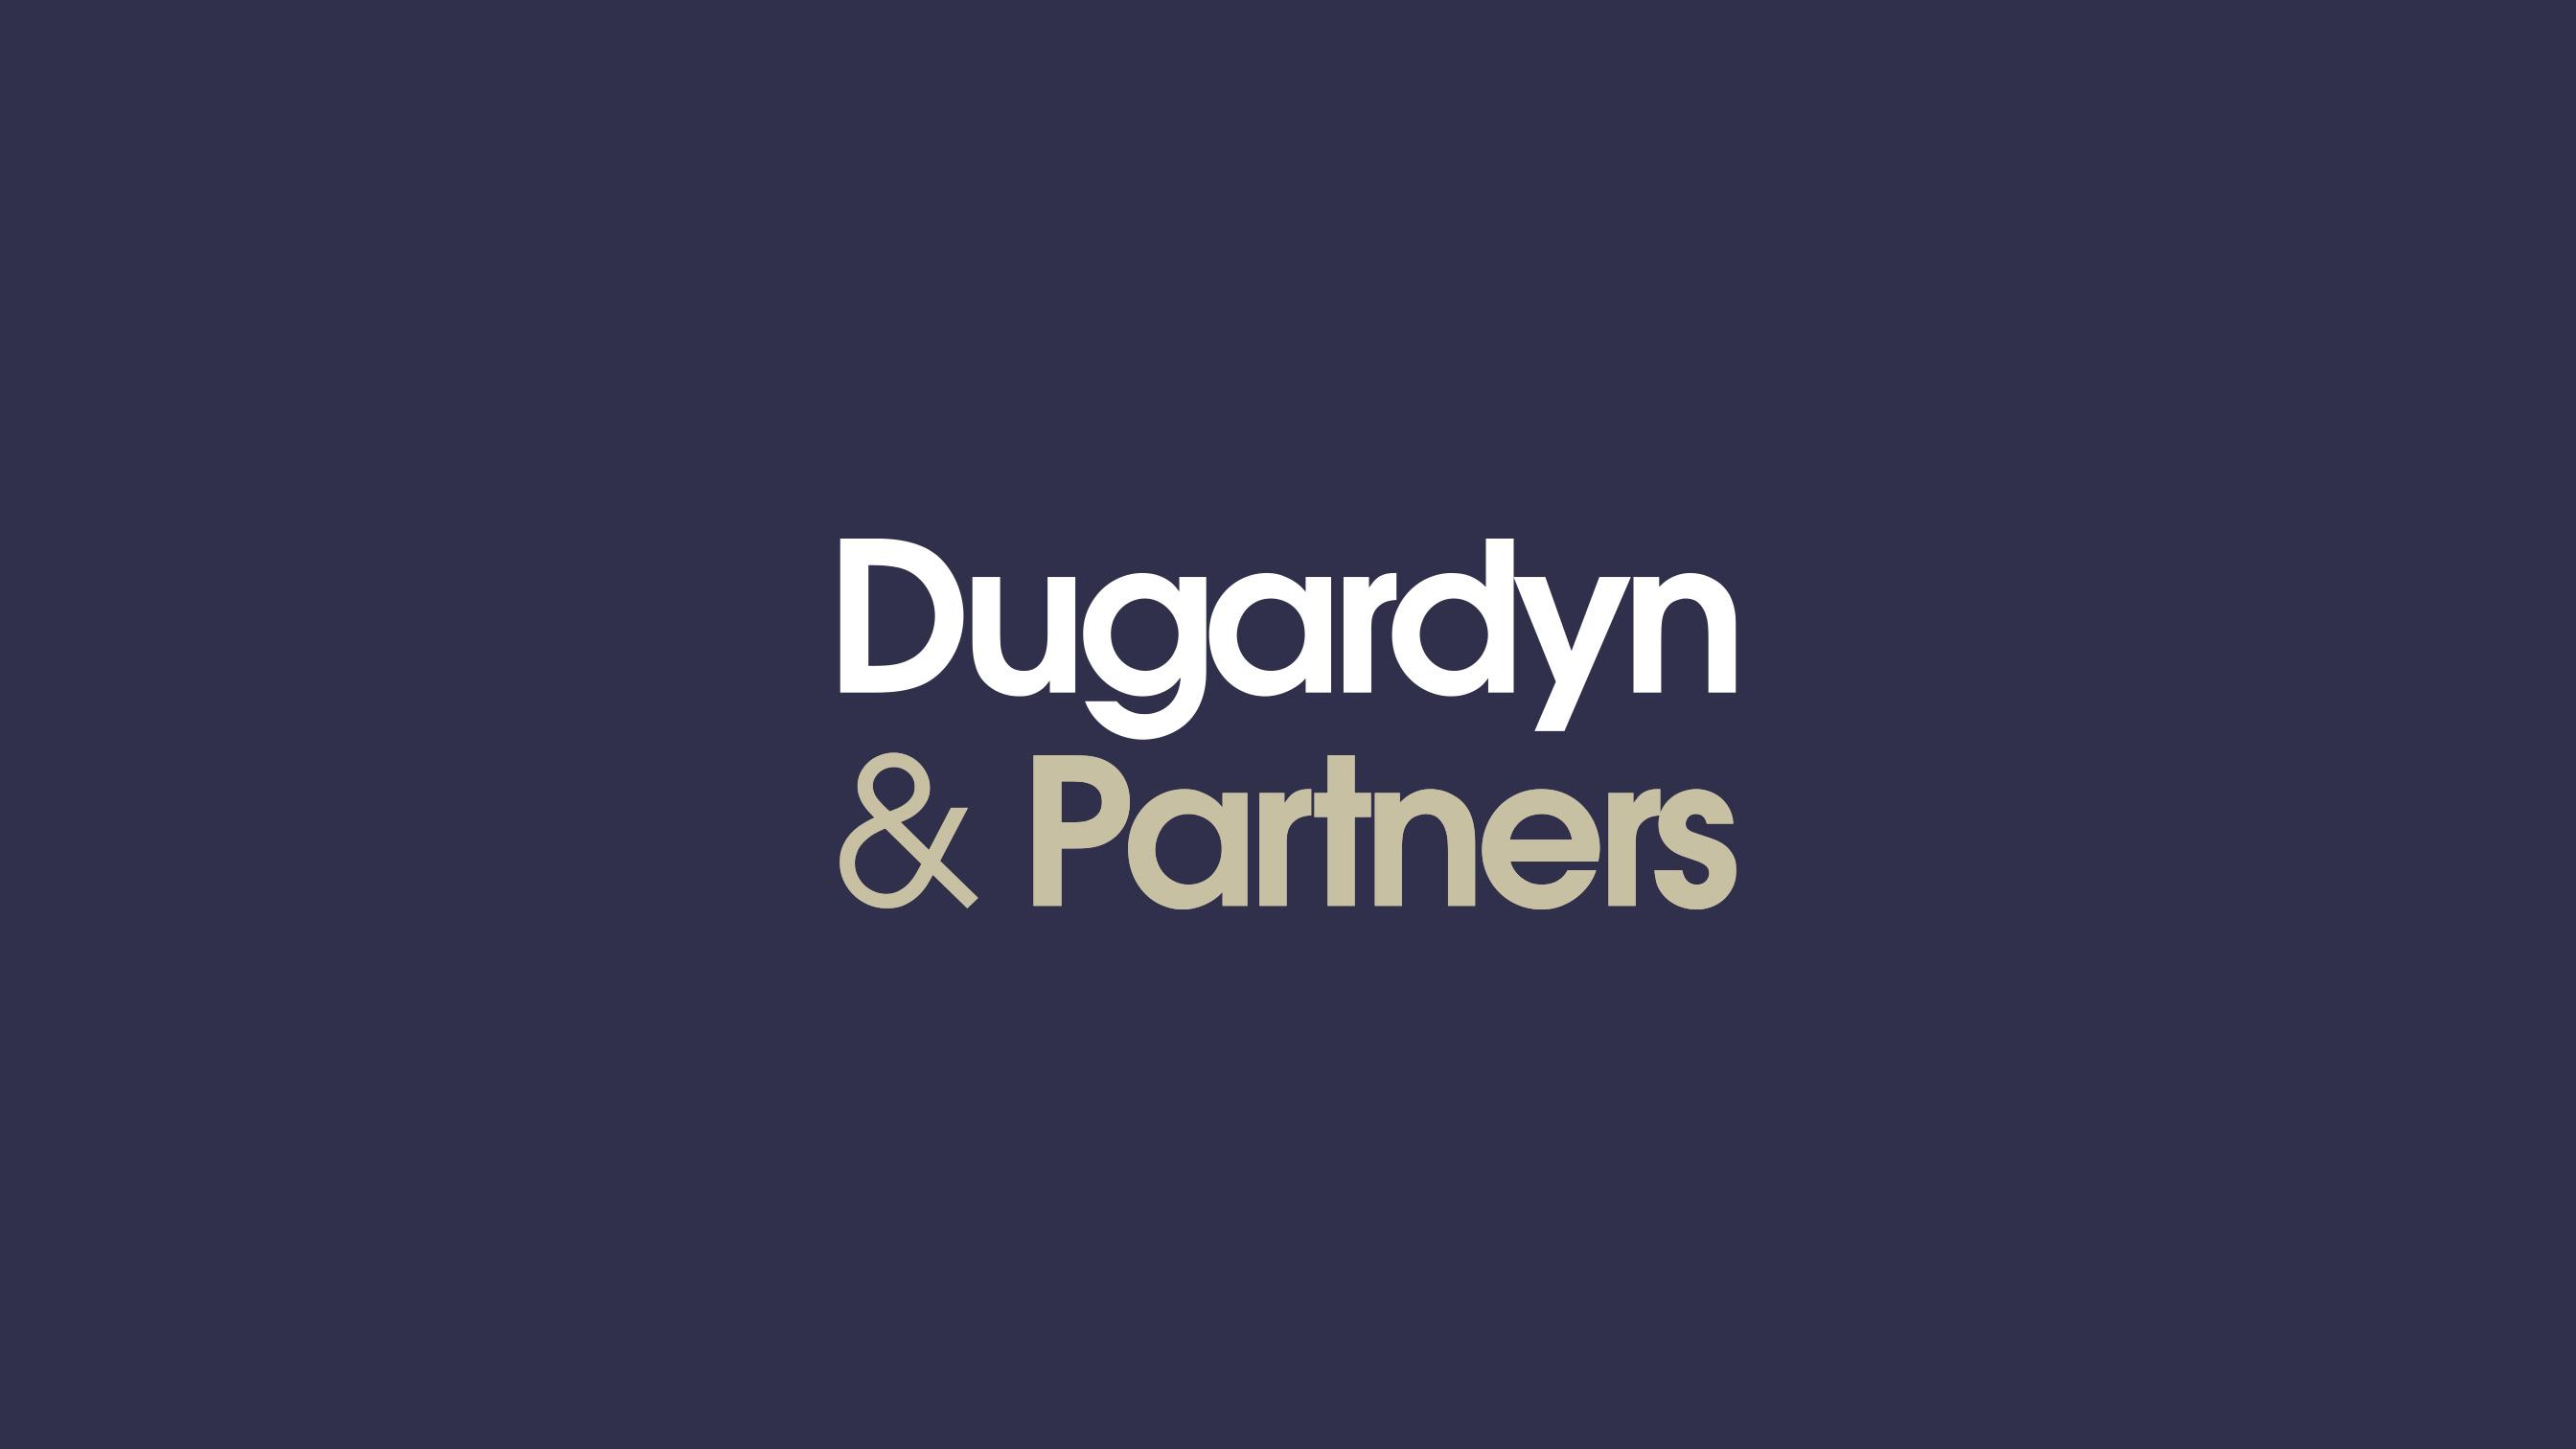 02-dugardyn-et-partners-pikteo-webdesign-graphic-design-freelance-paris-bruxelles-londres